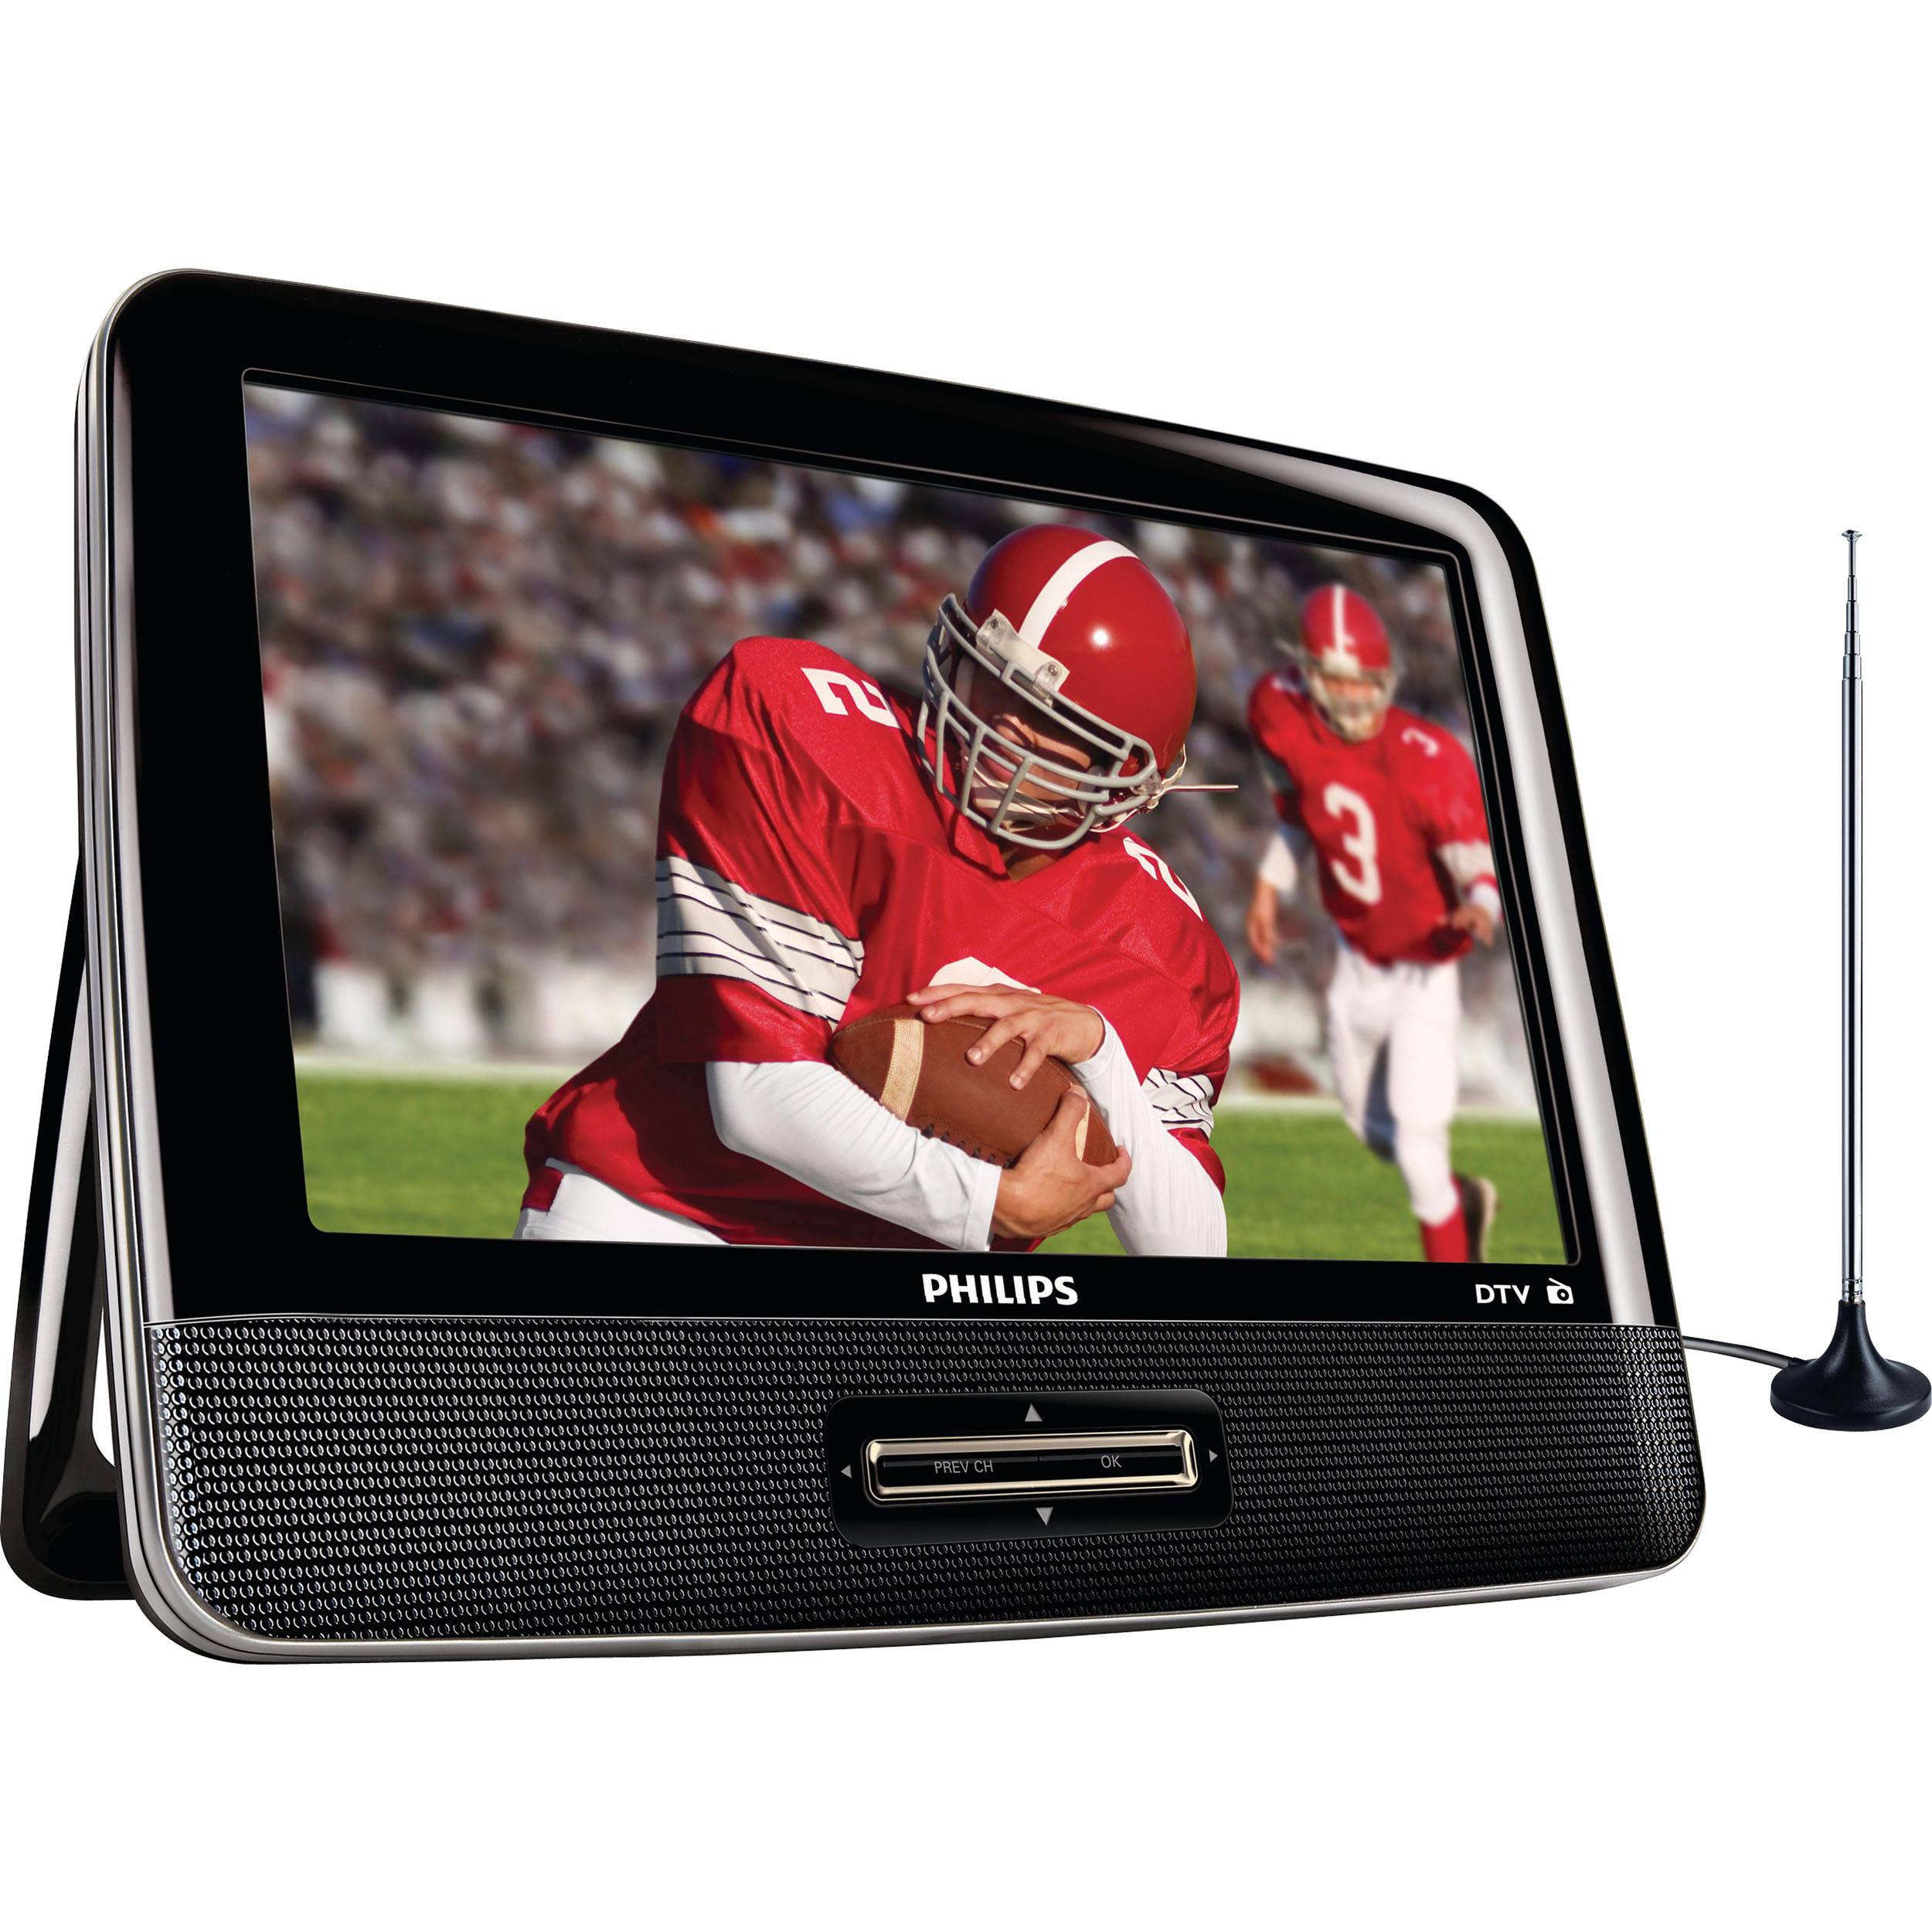 philips 9 portable lcd digital tv with fm tuner pt902 37. Black Bedroom Furniture Sets. Home Design Ideas